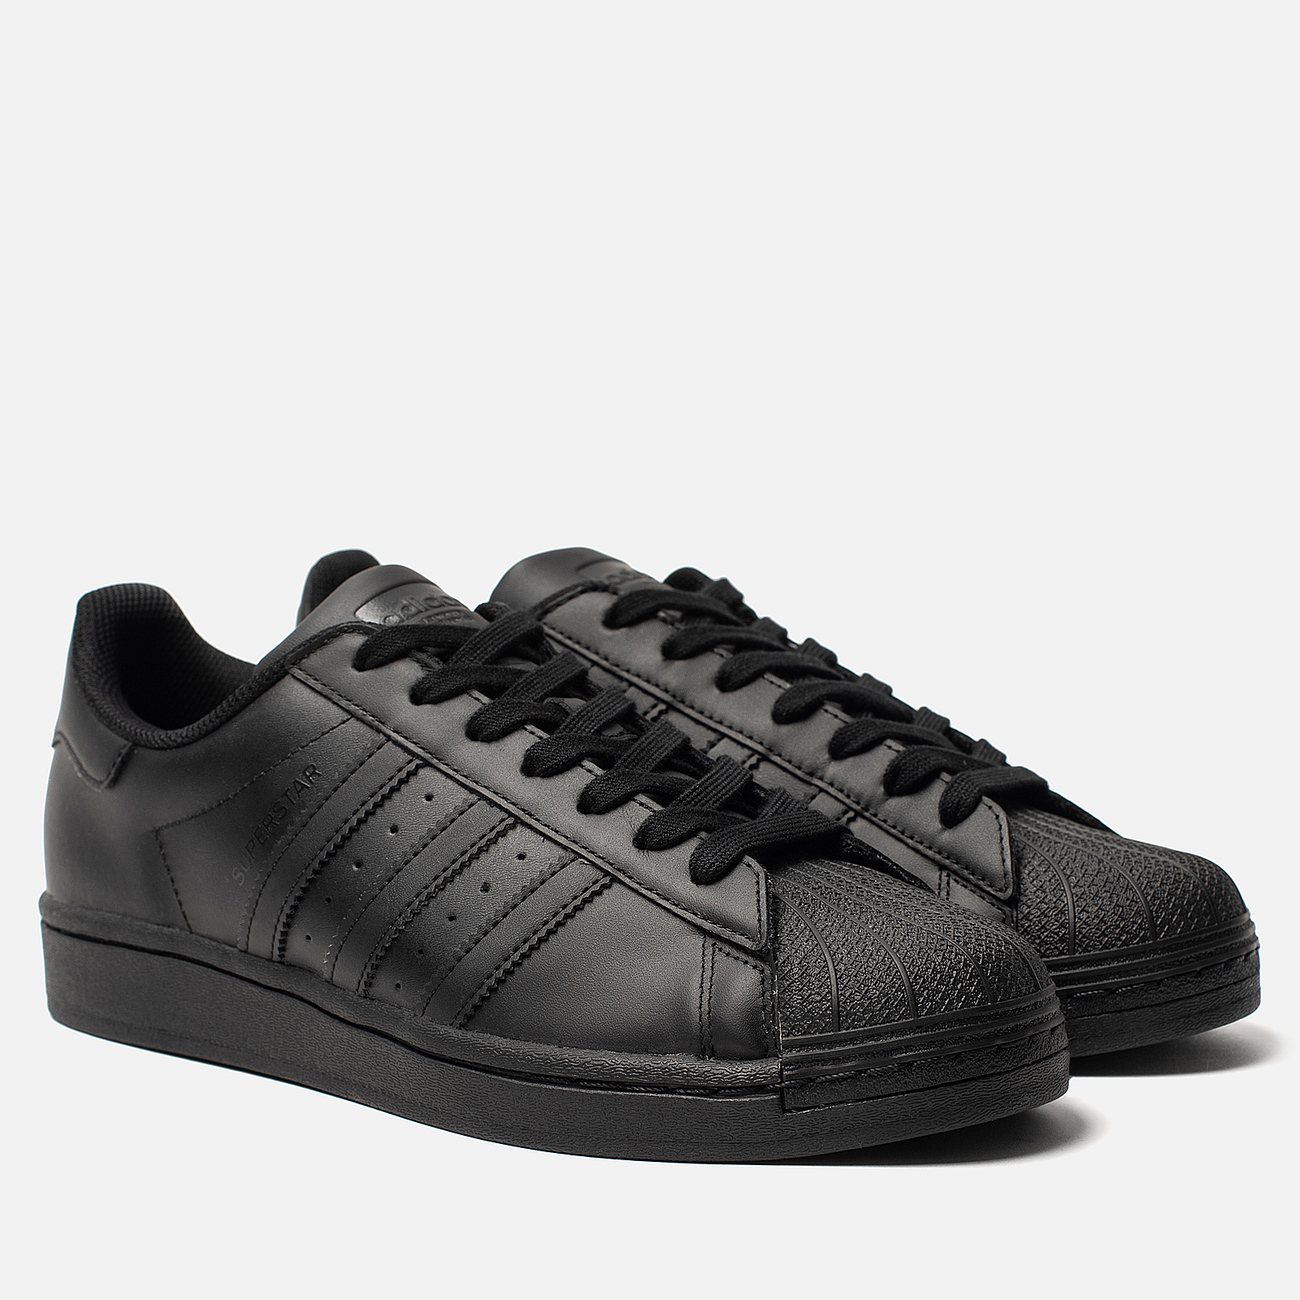 Кроссовки adidas Originals Superstar Core Black/Core Black